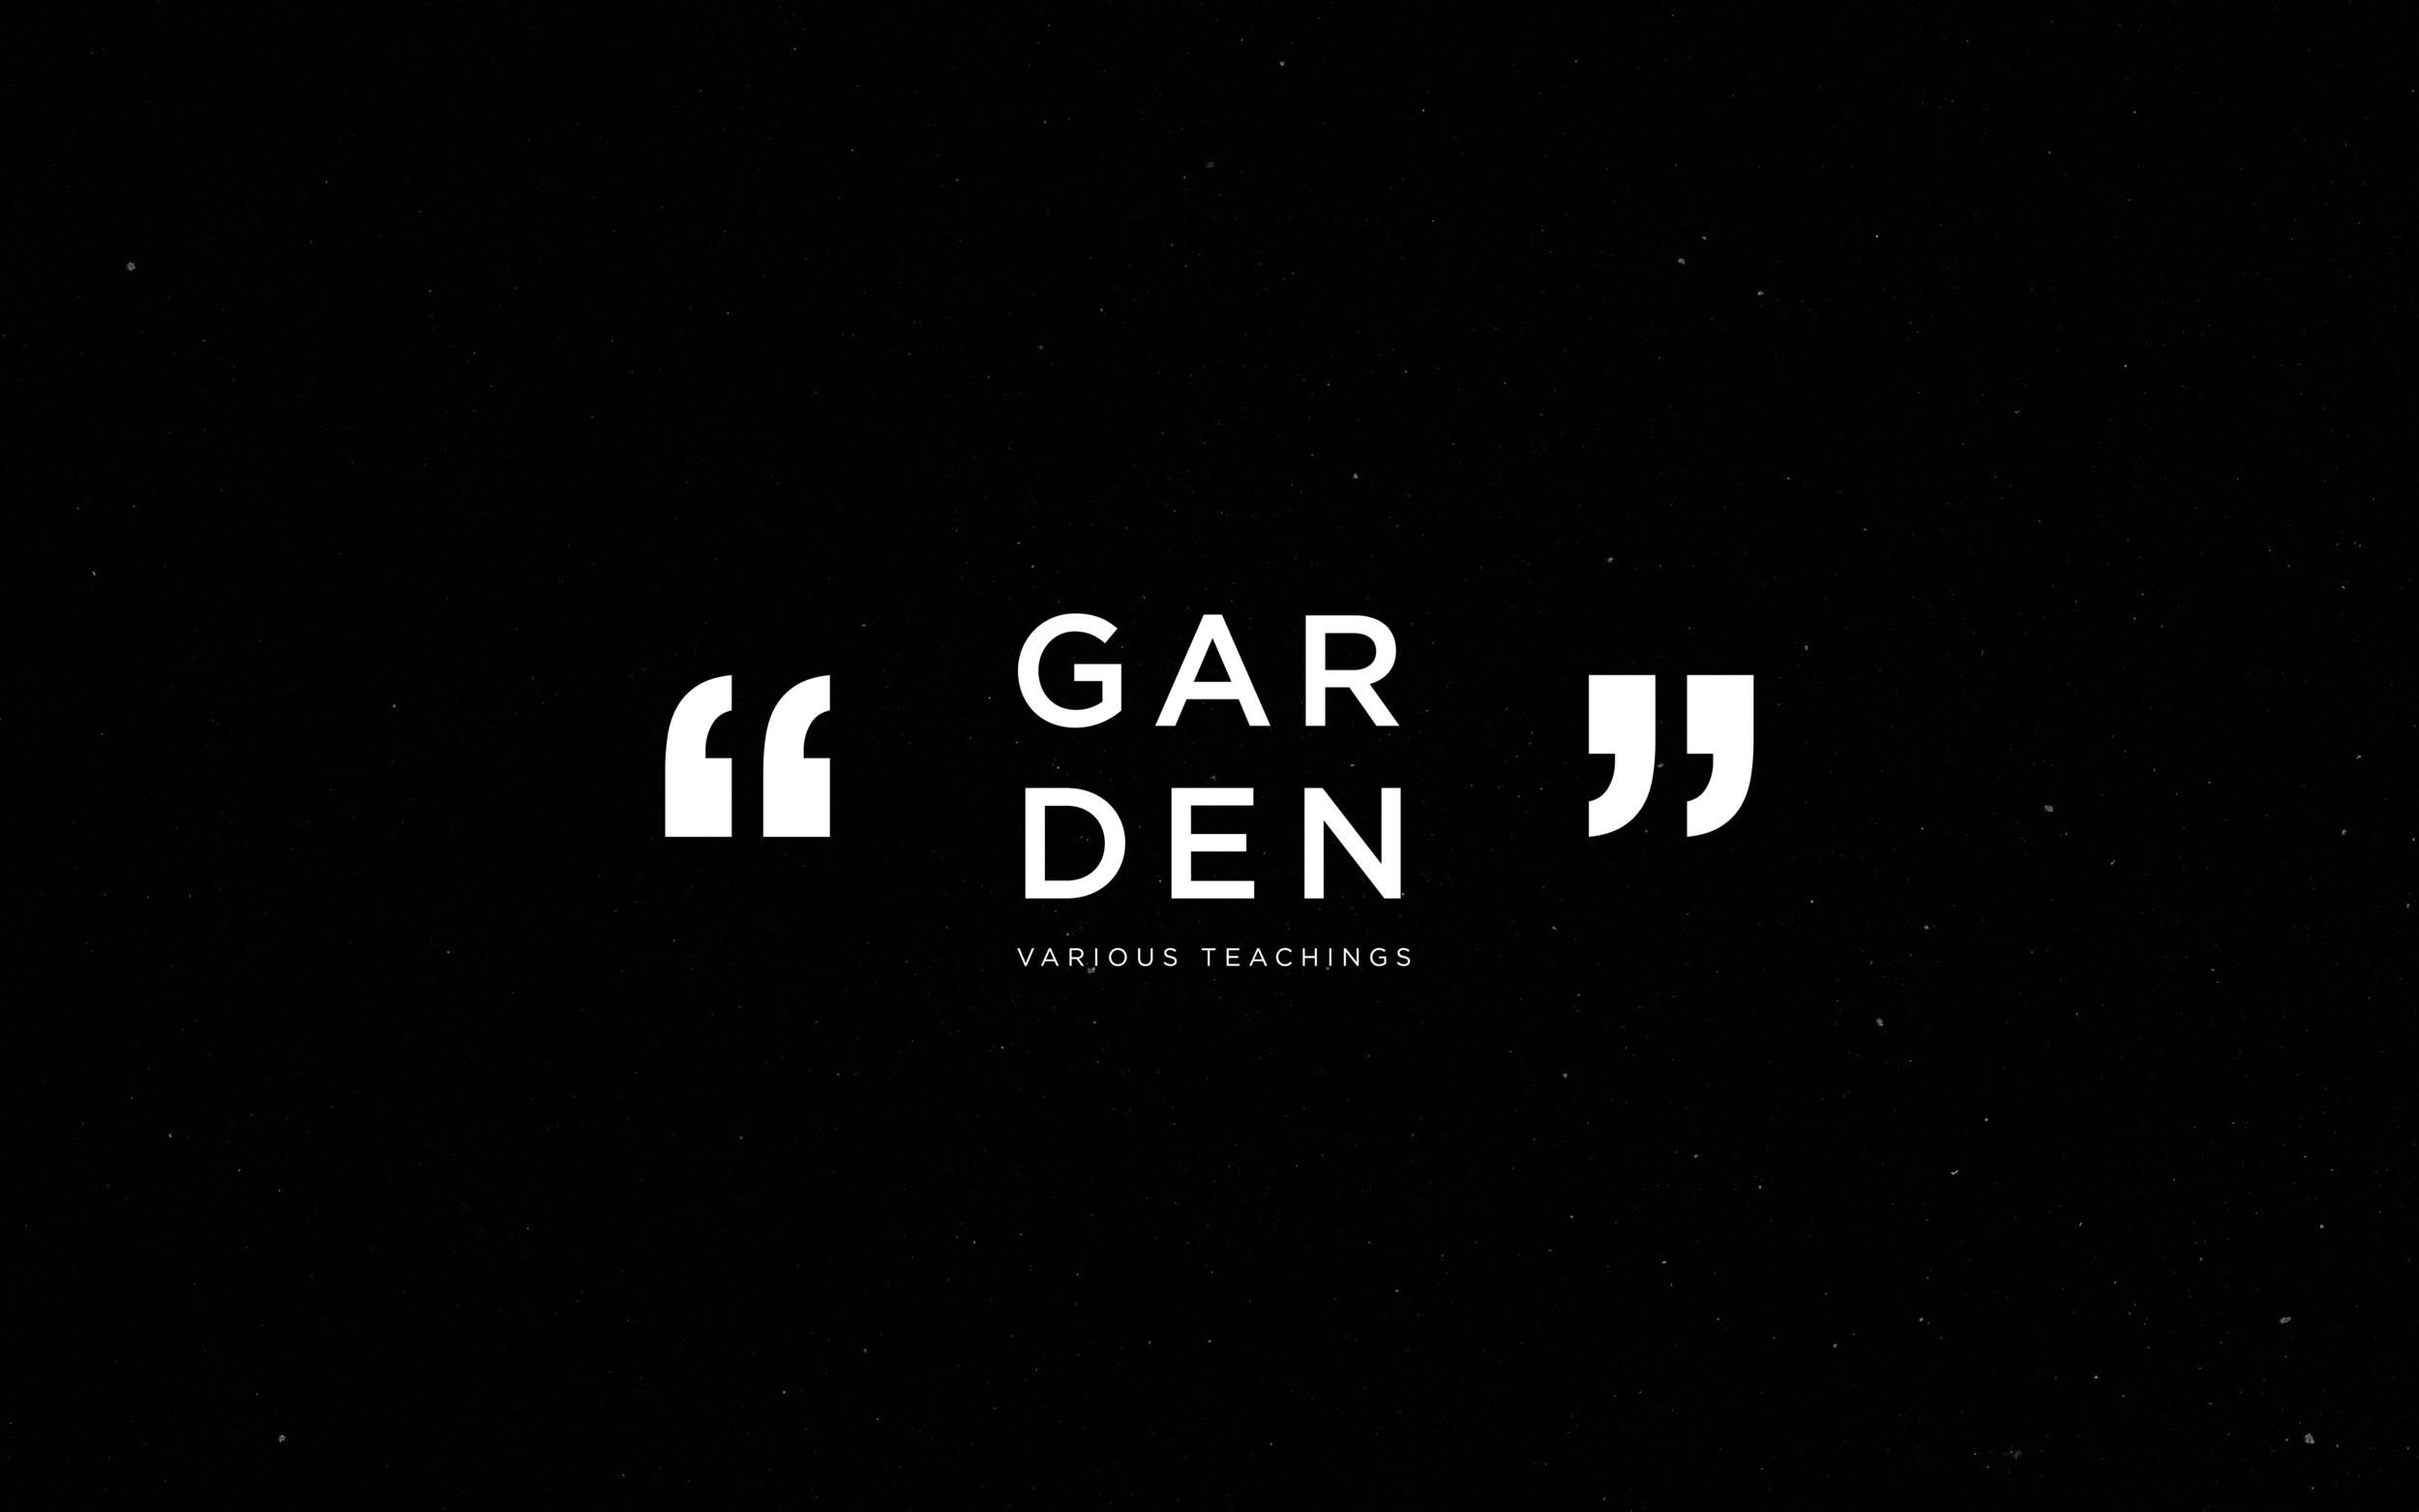 Garden-Various-Teachings-2019.png